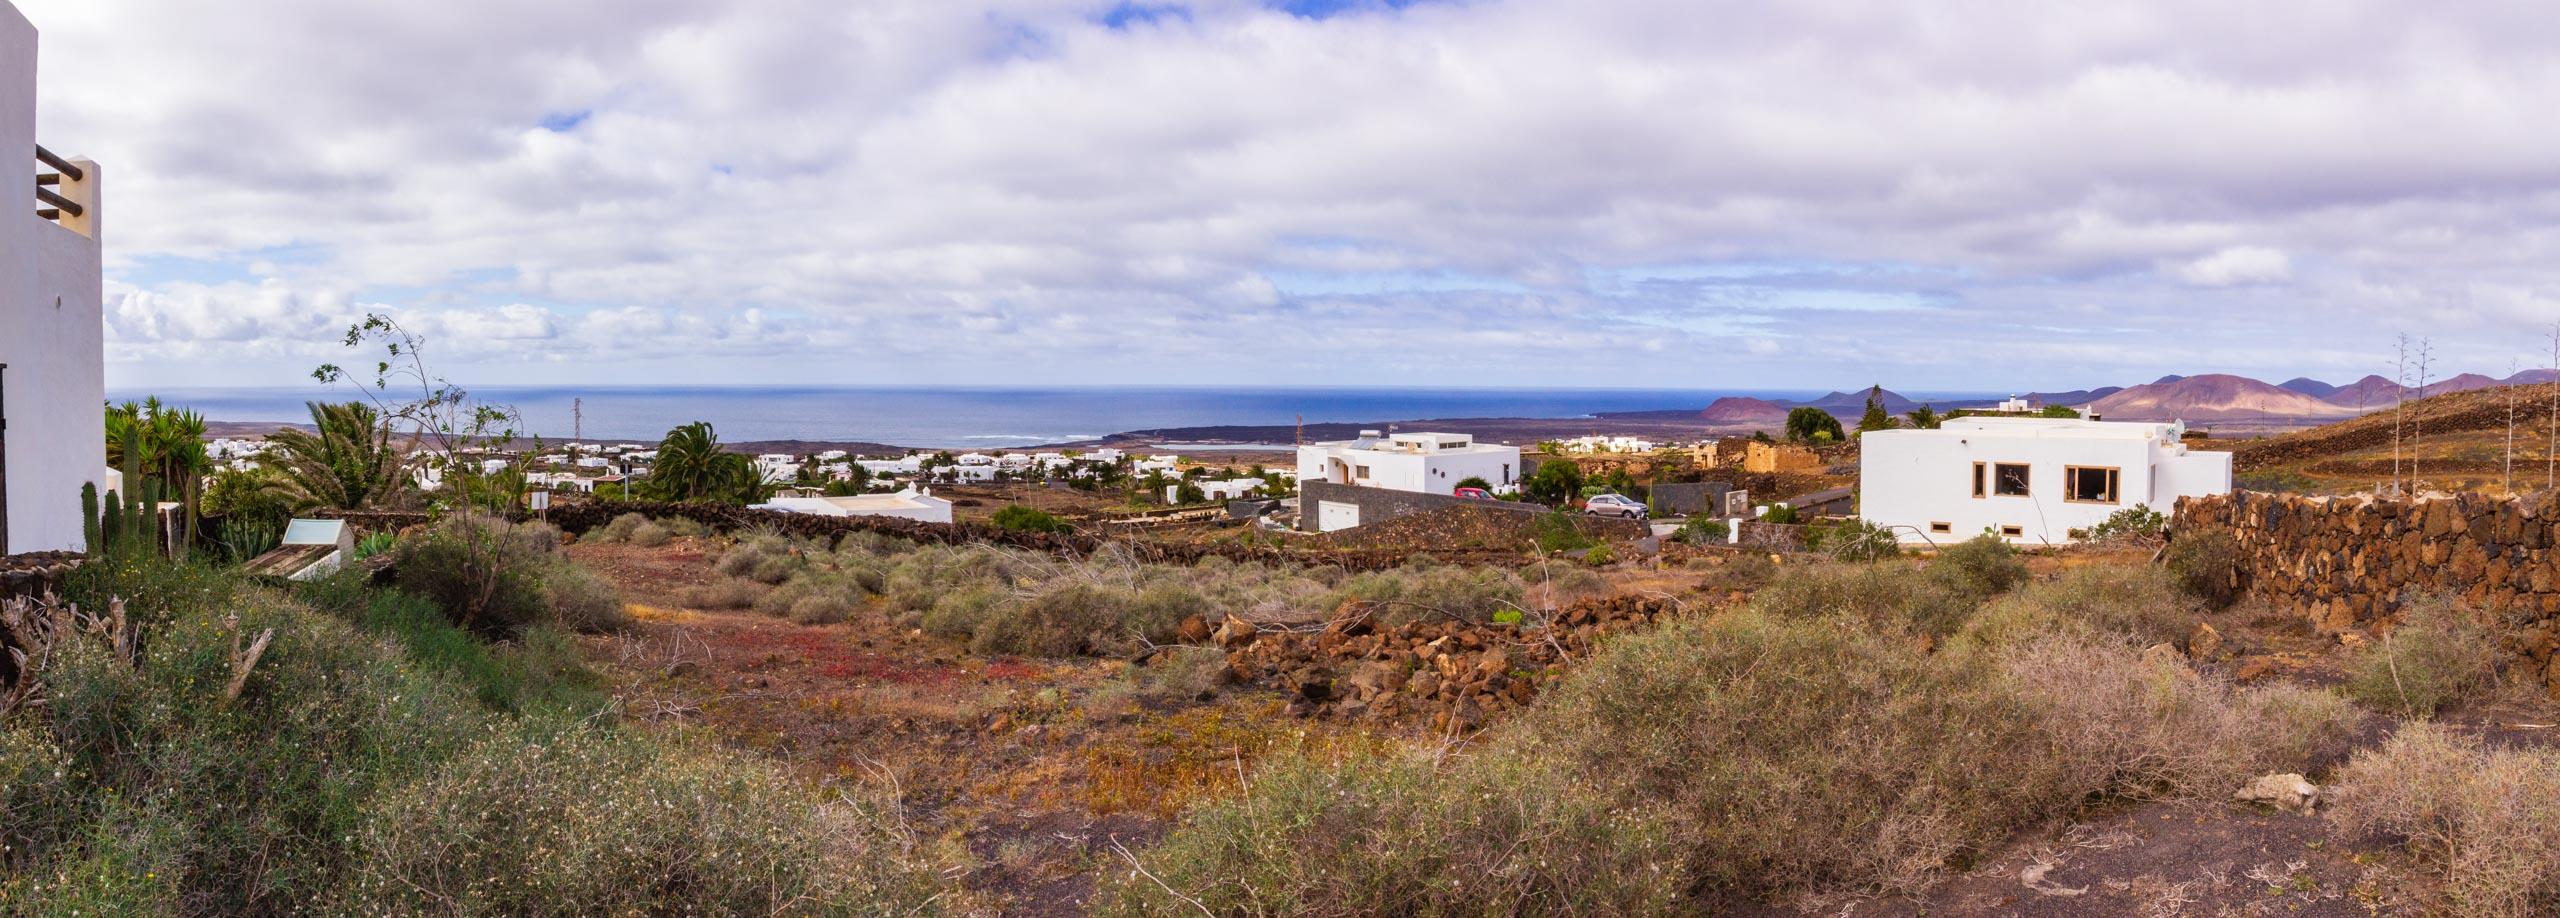 2019 01 LasBrenas December Panorama 2560 001